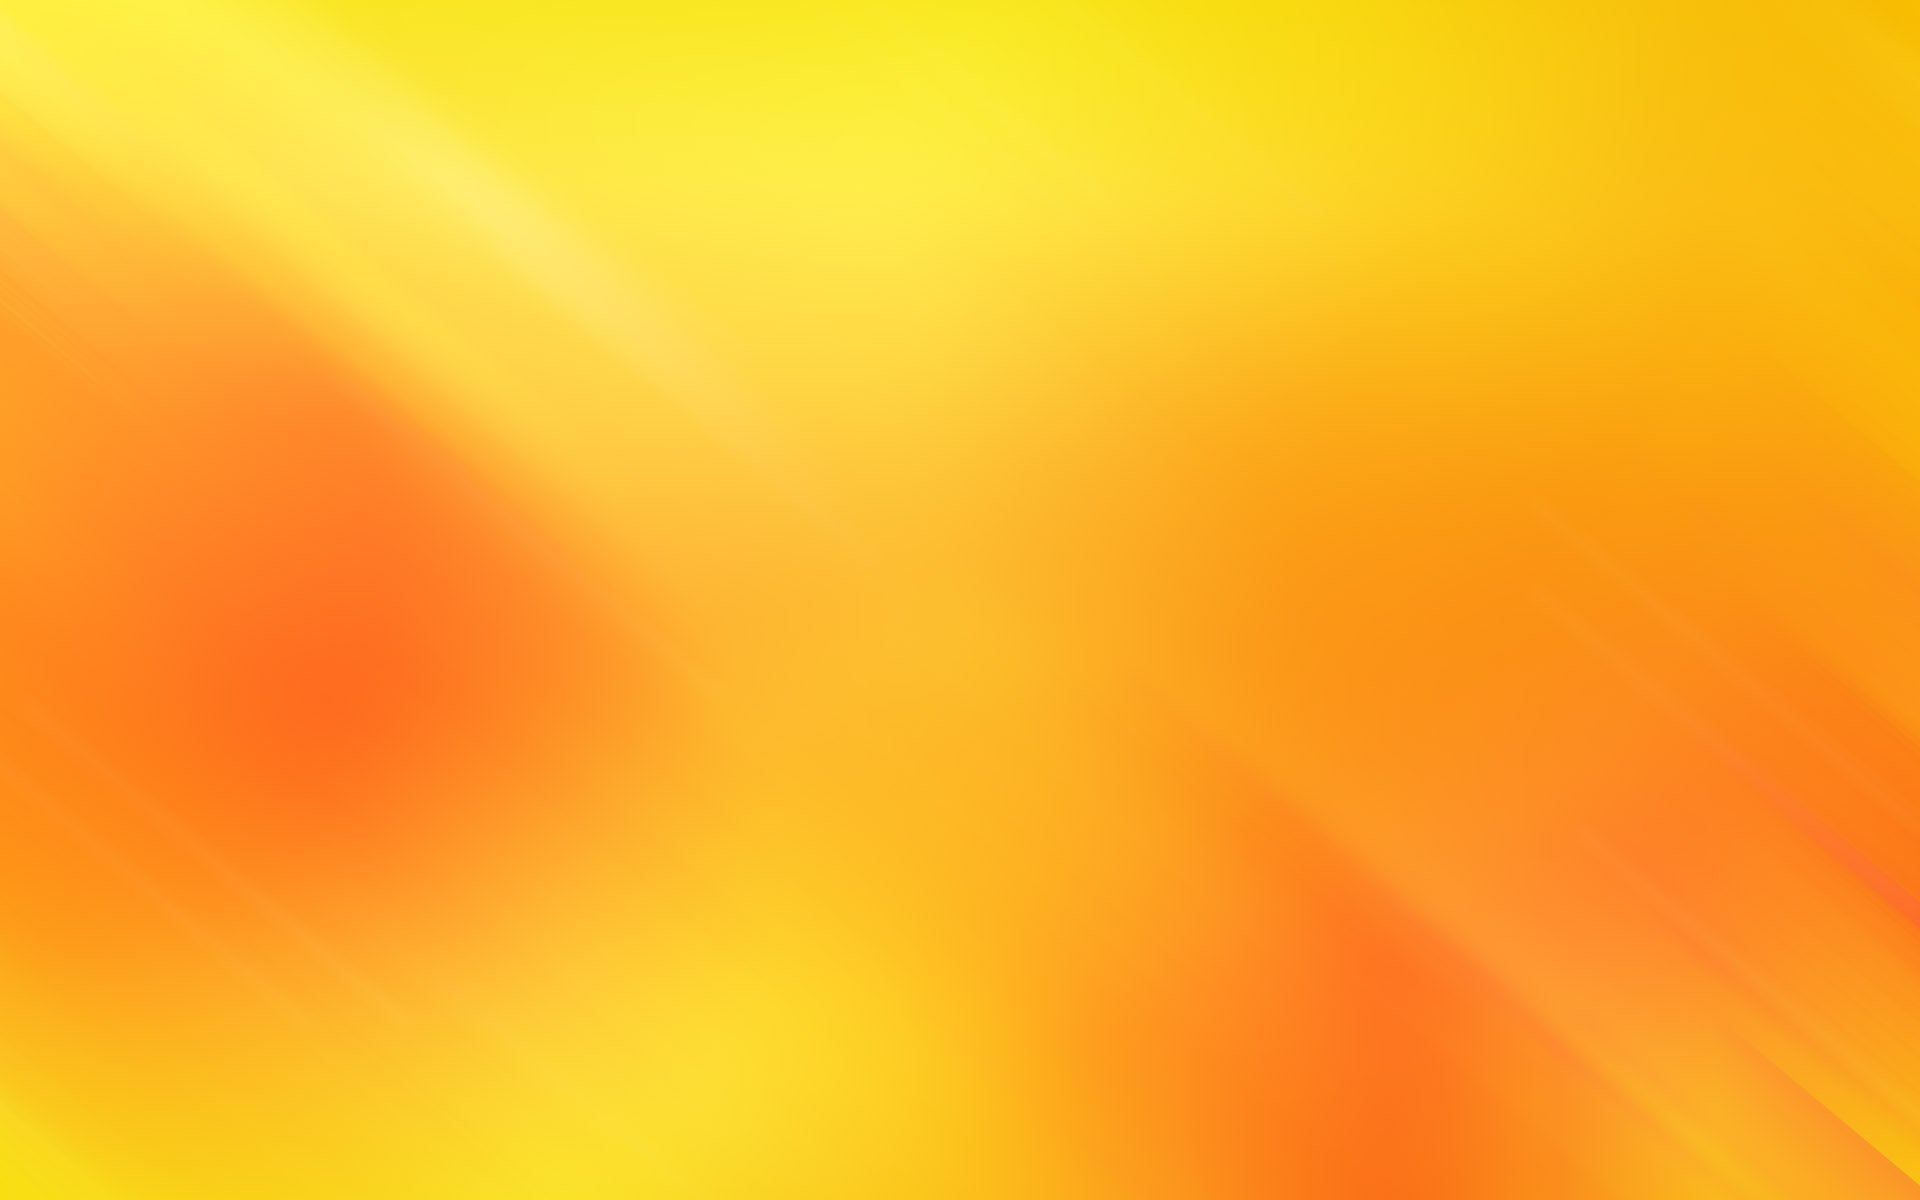 Yellow Abstract Wallpaper Hd Orange Textures Wallpaper 1920x1200 242629 Wallpaperup